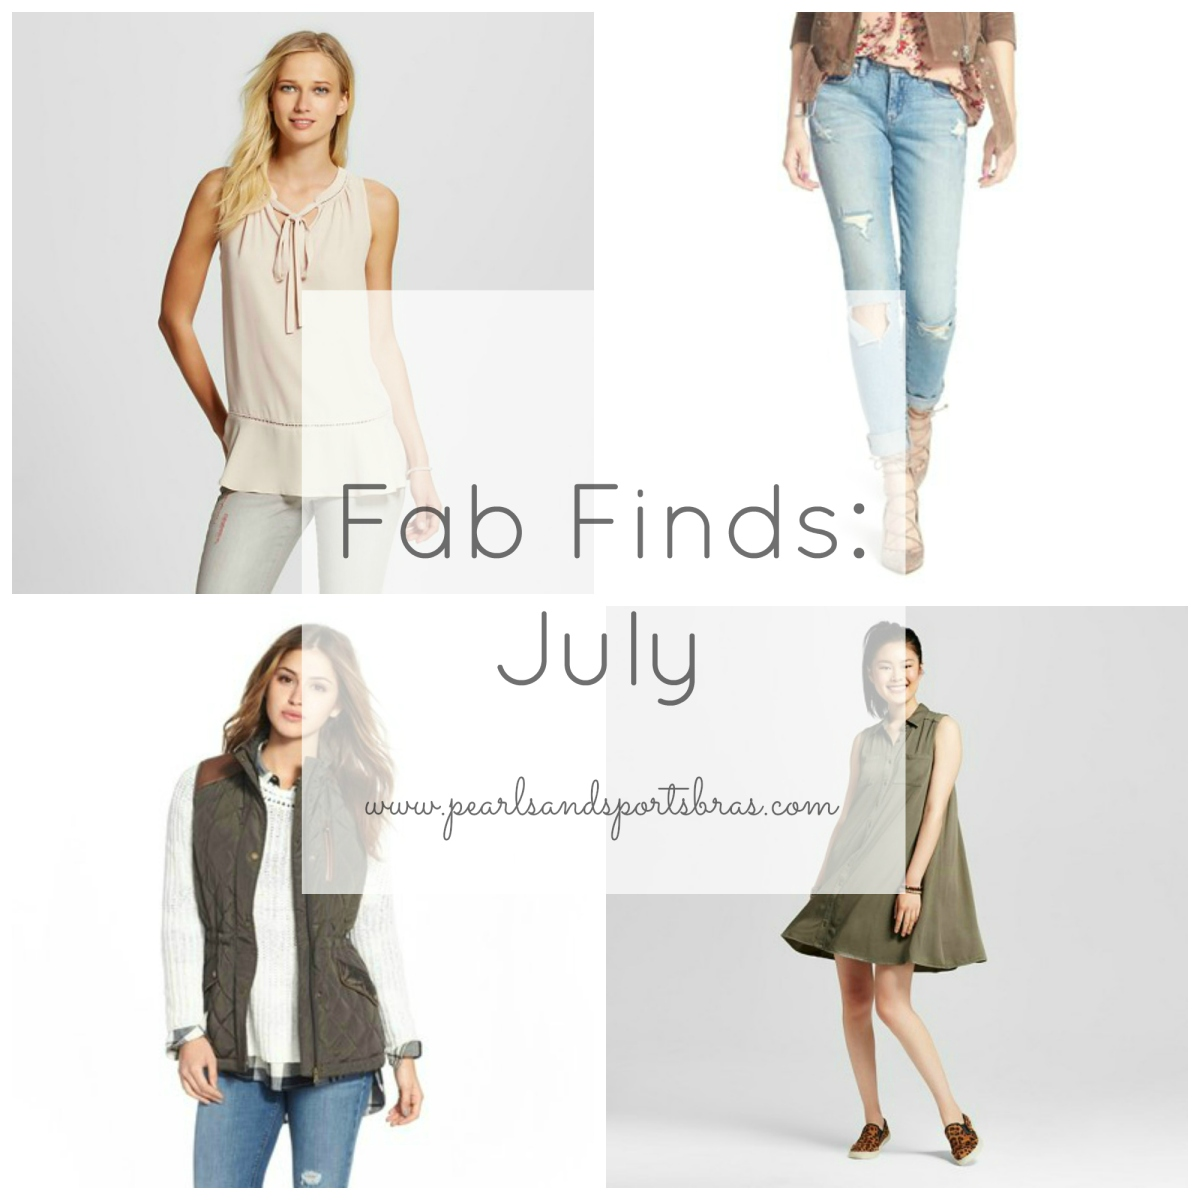 Fab Finds July 2016 |www.pearlsandsportsbras.com|